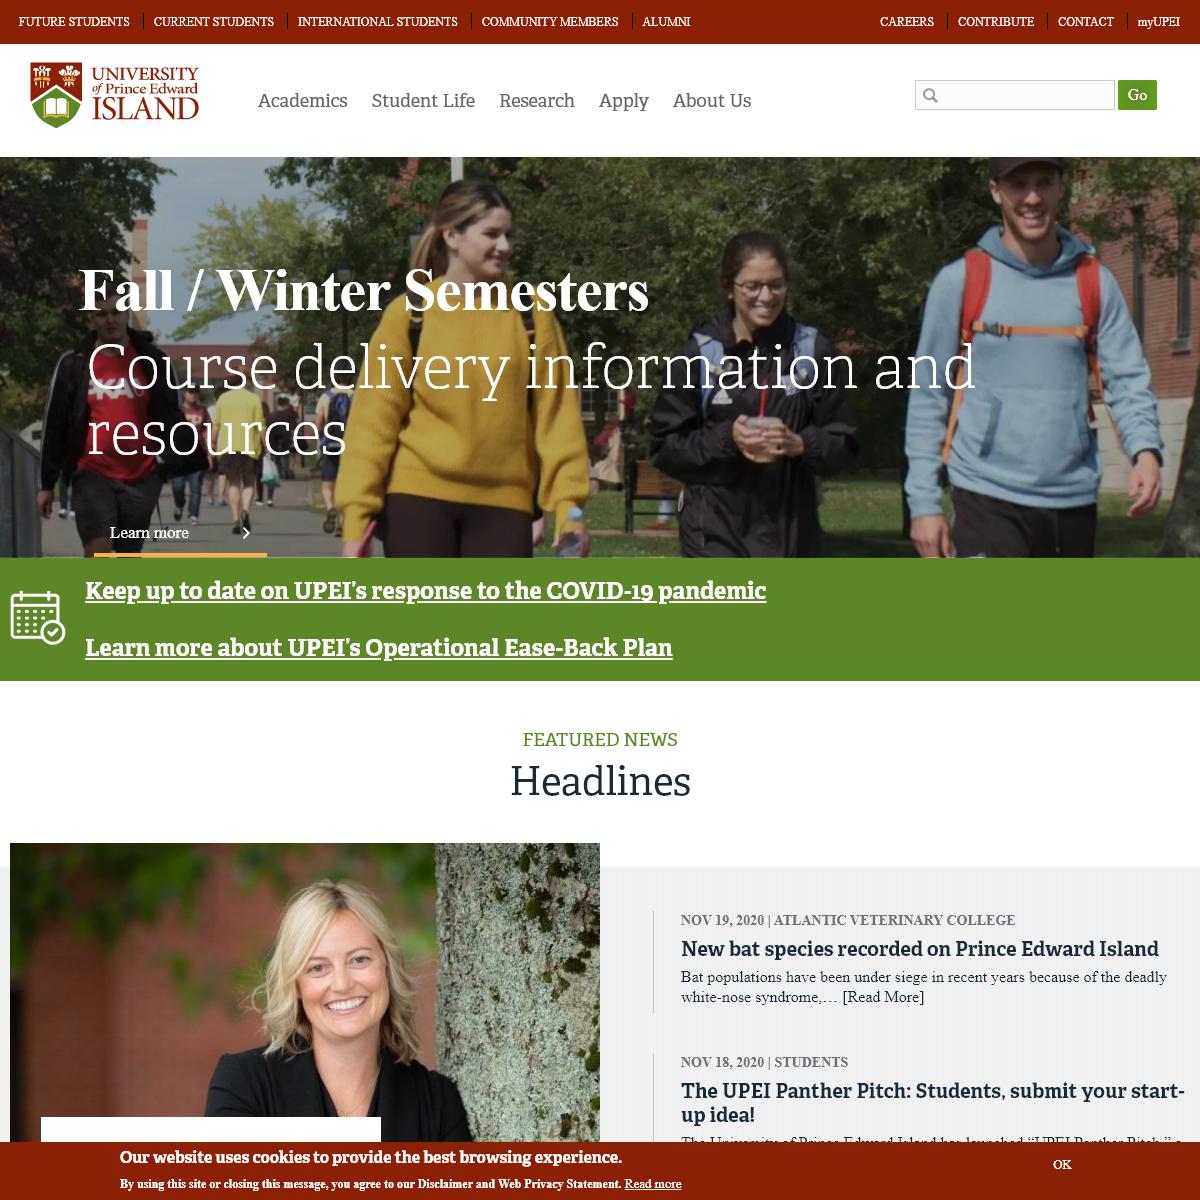 UPEI Home Page - University of Prince Edward Island